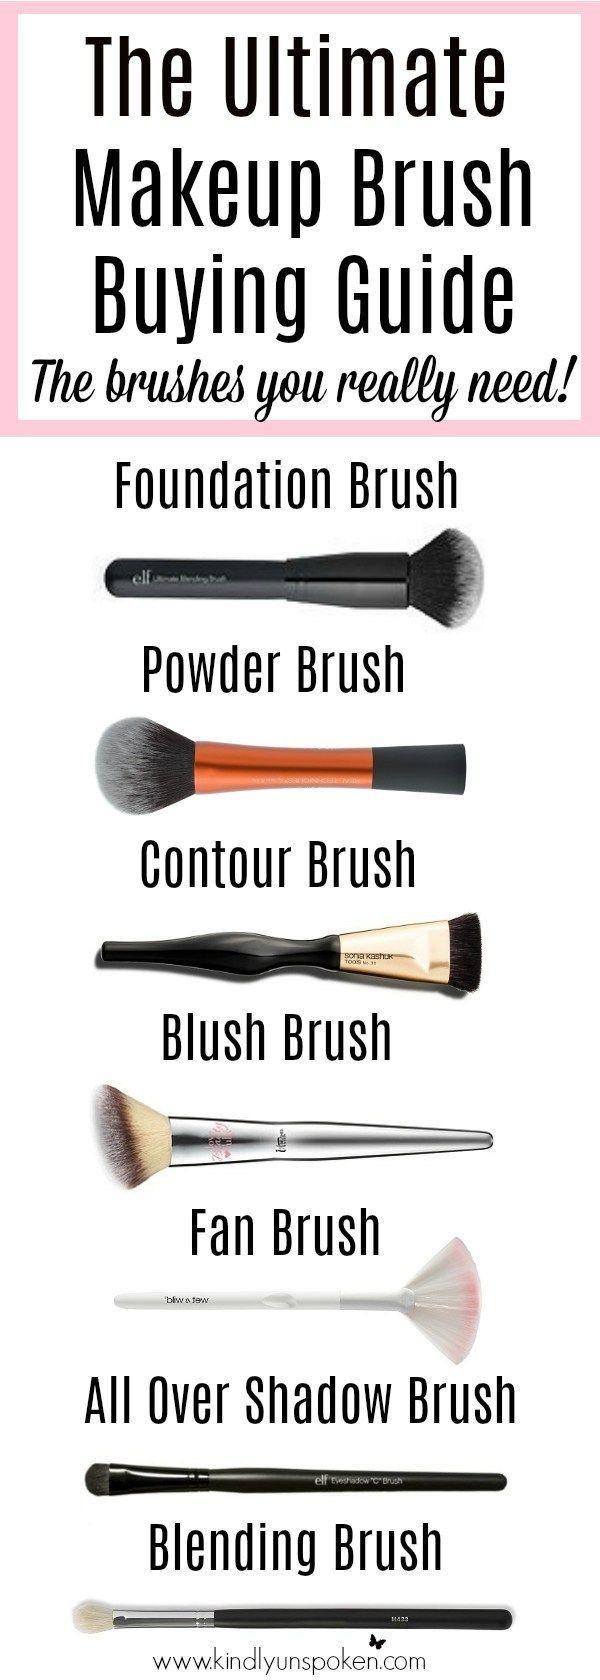 Photo of Ultimate Makeup Brush Guide – Kindly Unspoken